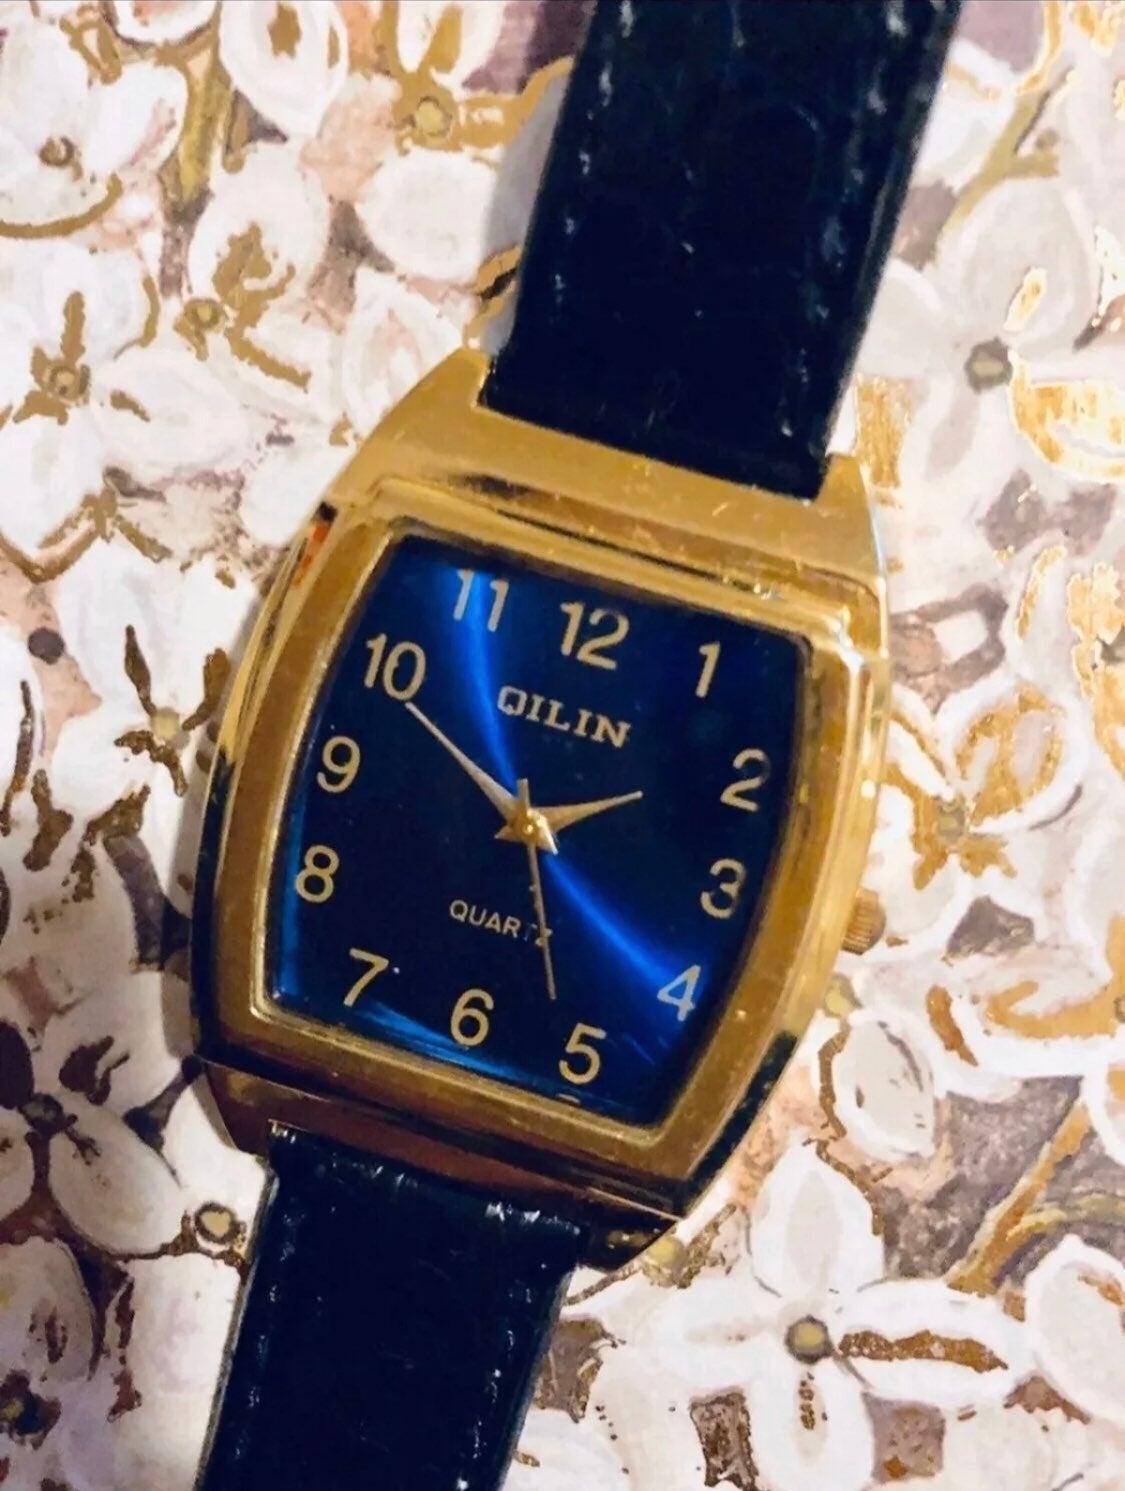 Qilin Watch - new